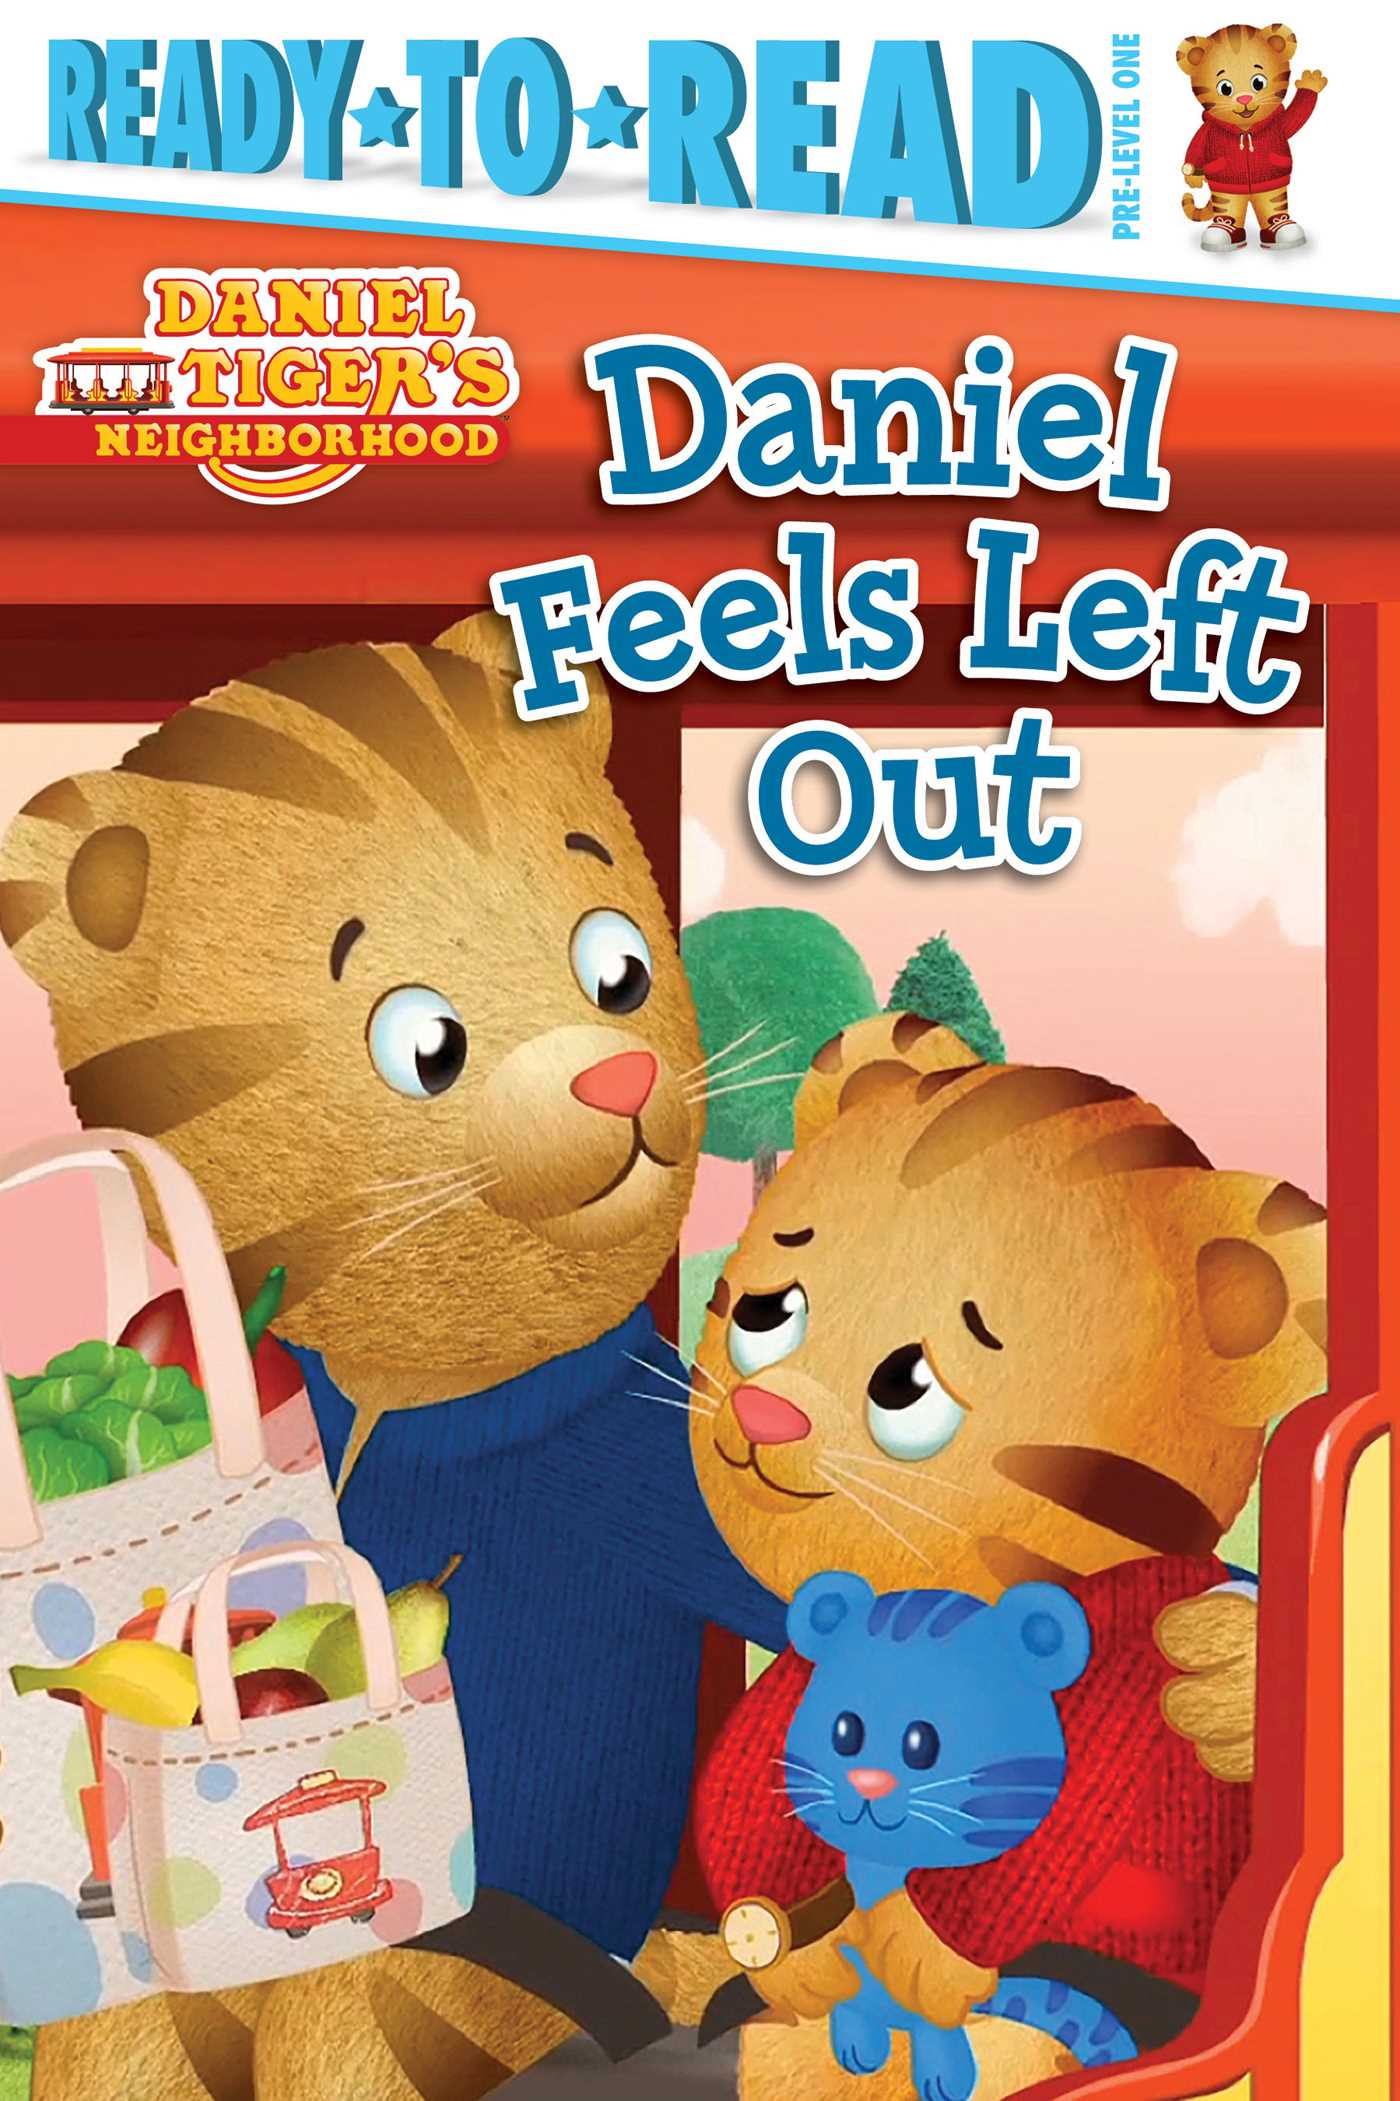 Daniel feels left out 9781481438353 hr